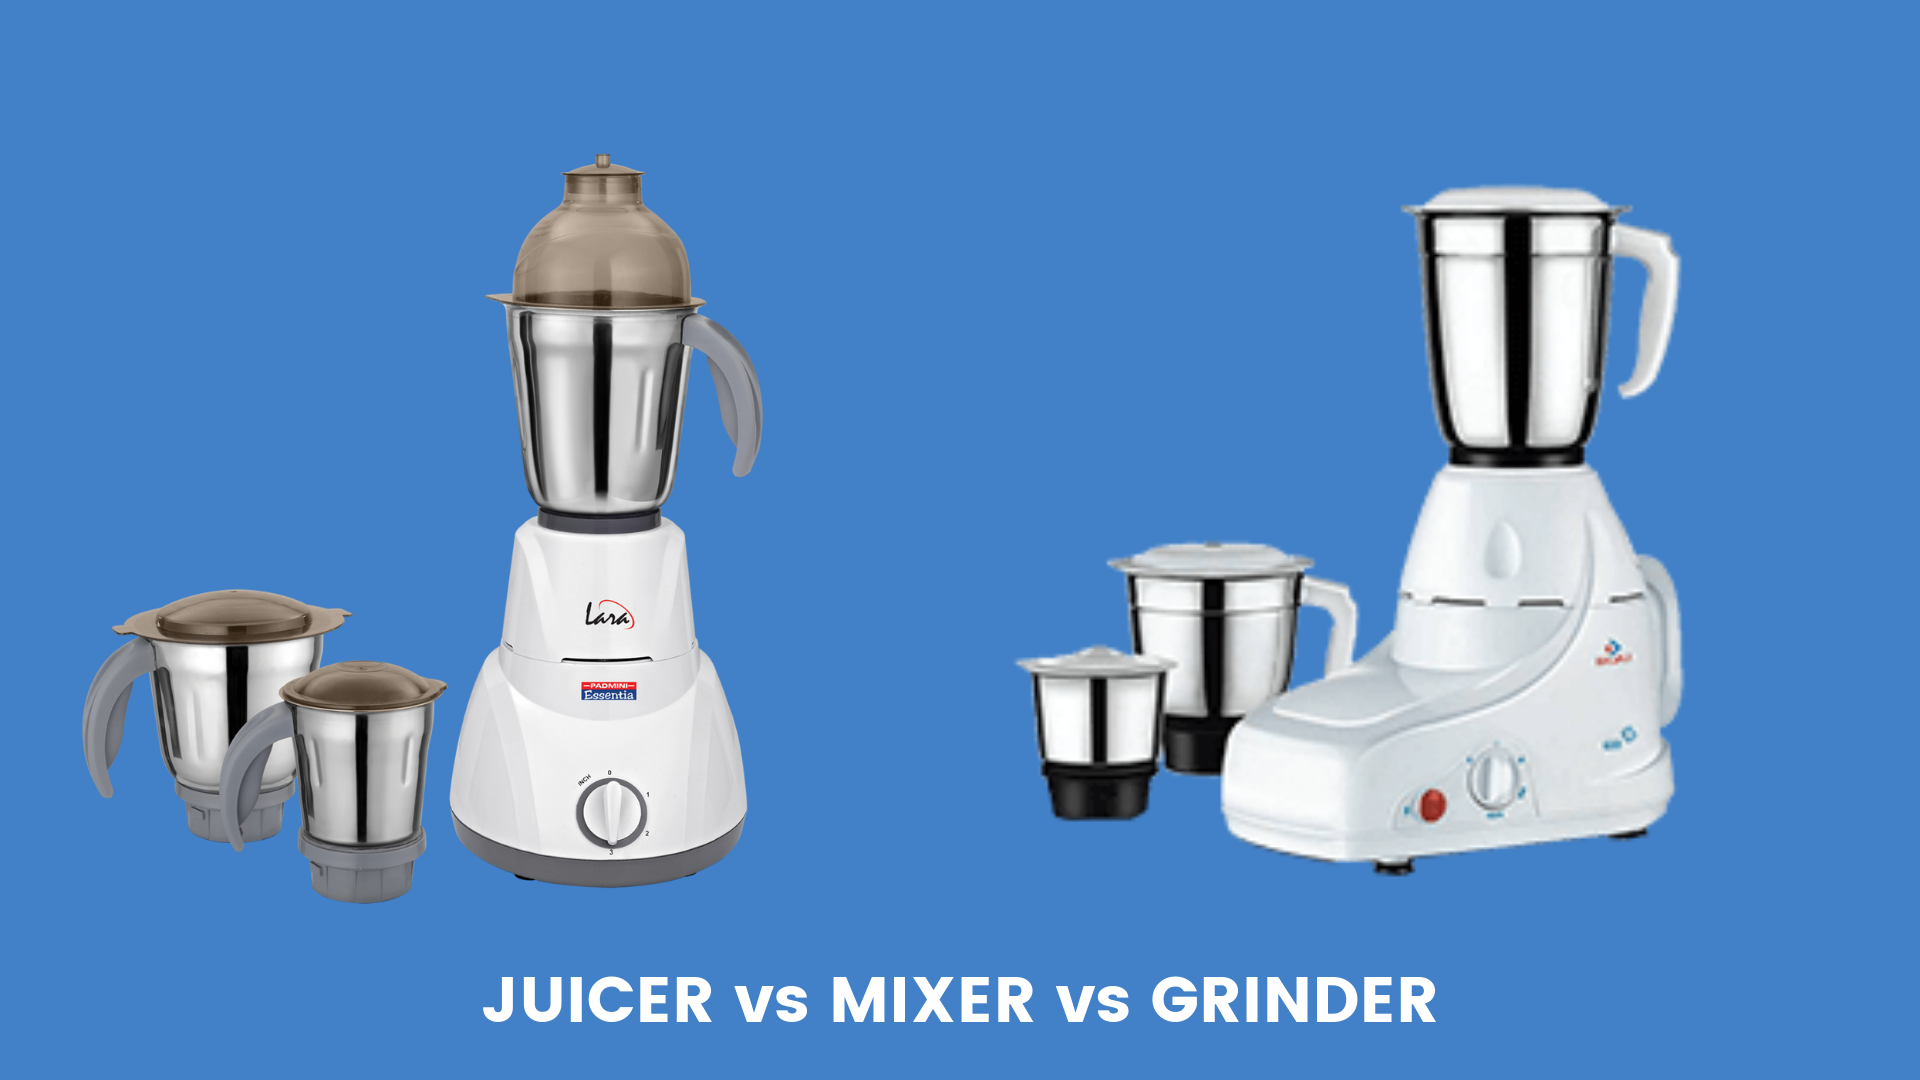 mixer vs juicer vs grinder